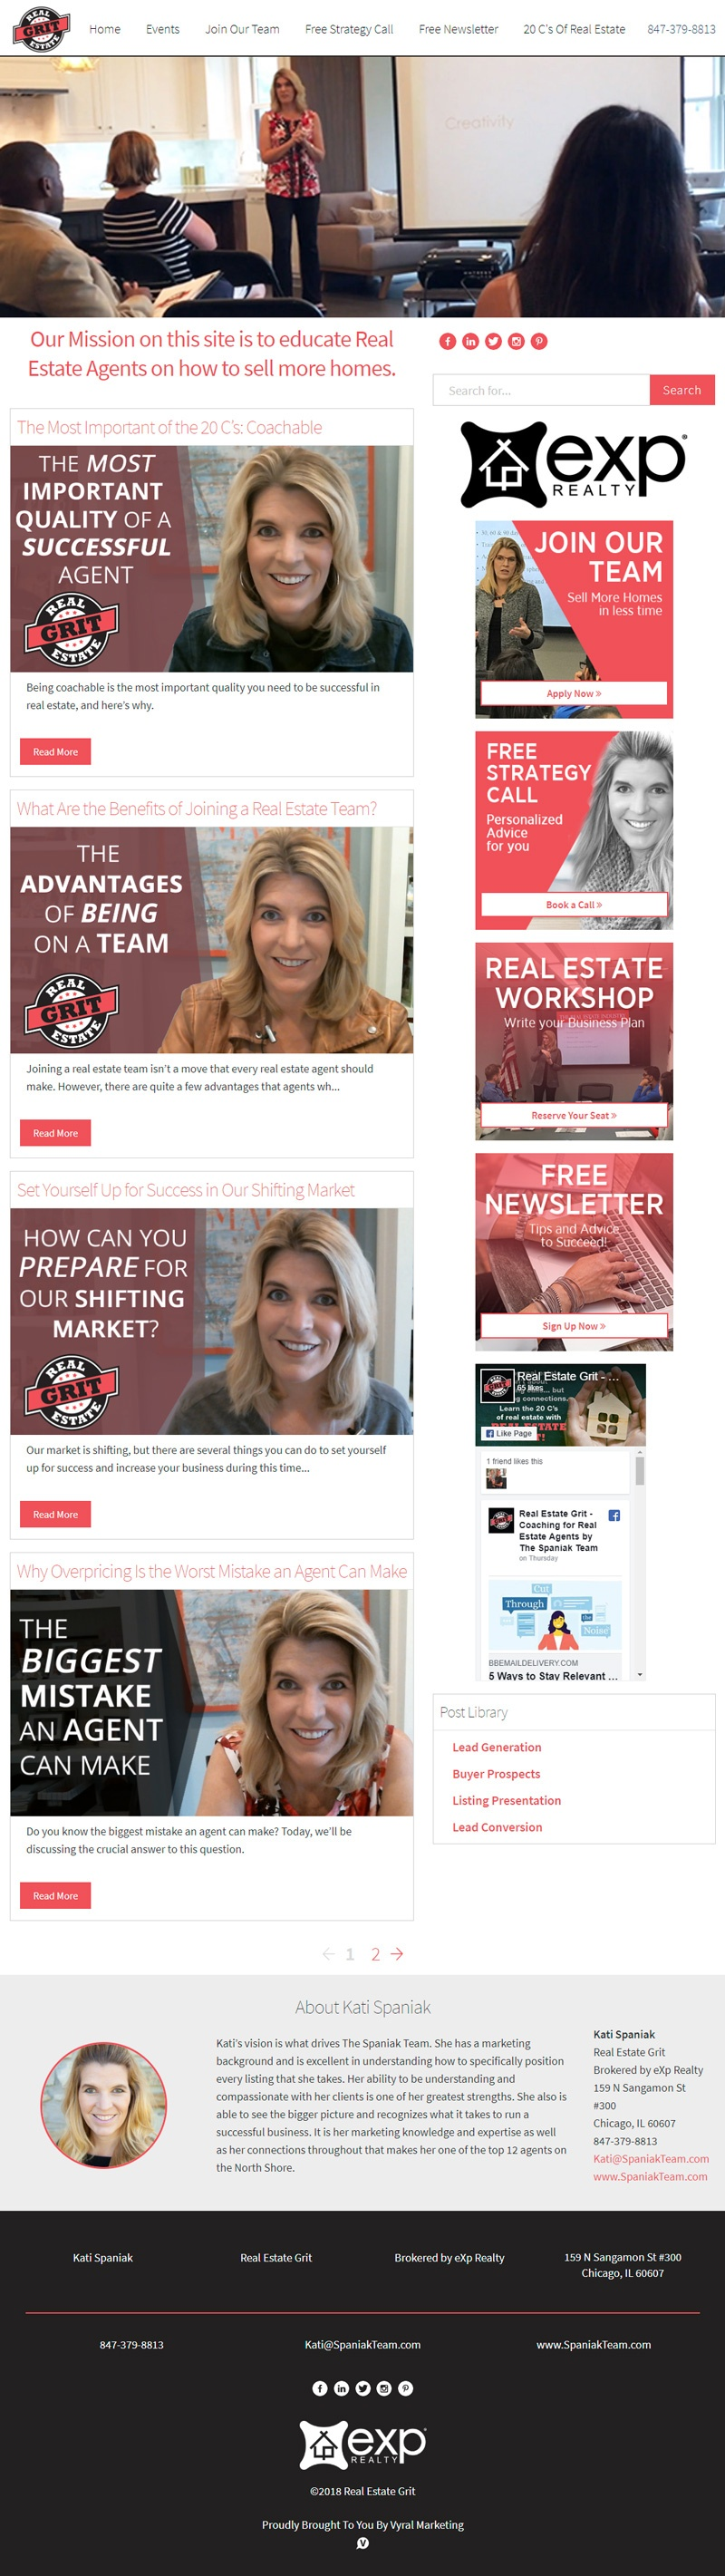 Kati-Agent-Training-Website